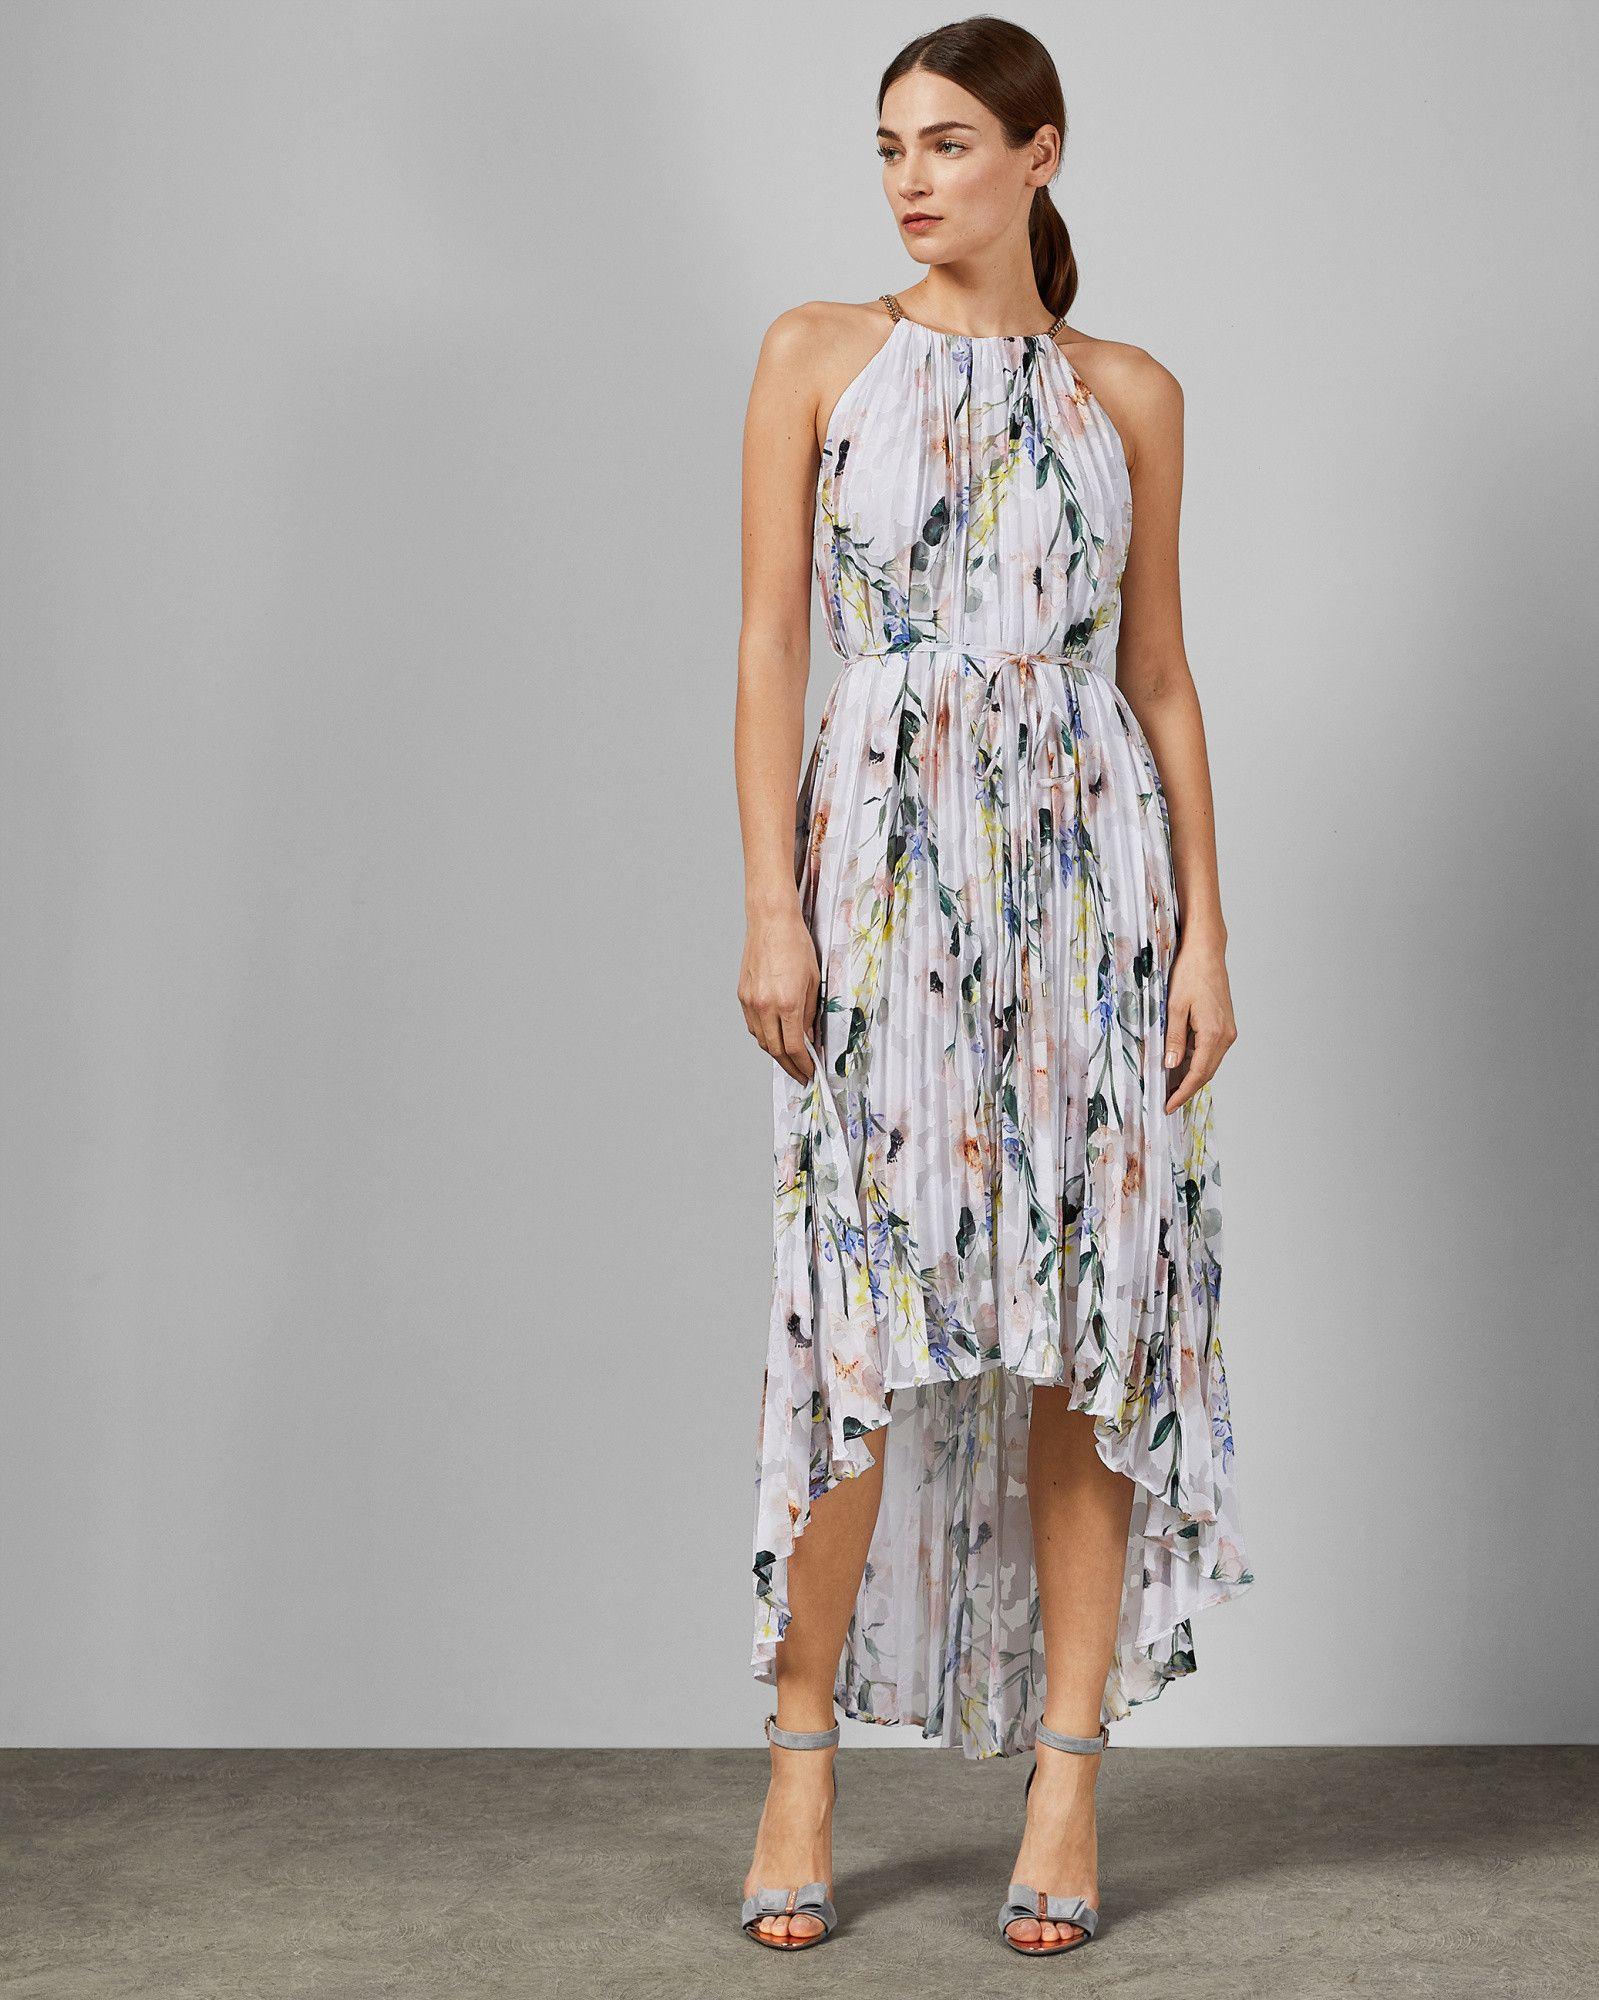 white sz 2 UK 10 nEW Ted Baker Elegance Pleat hight low maxi wedding Dress